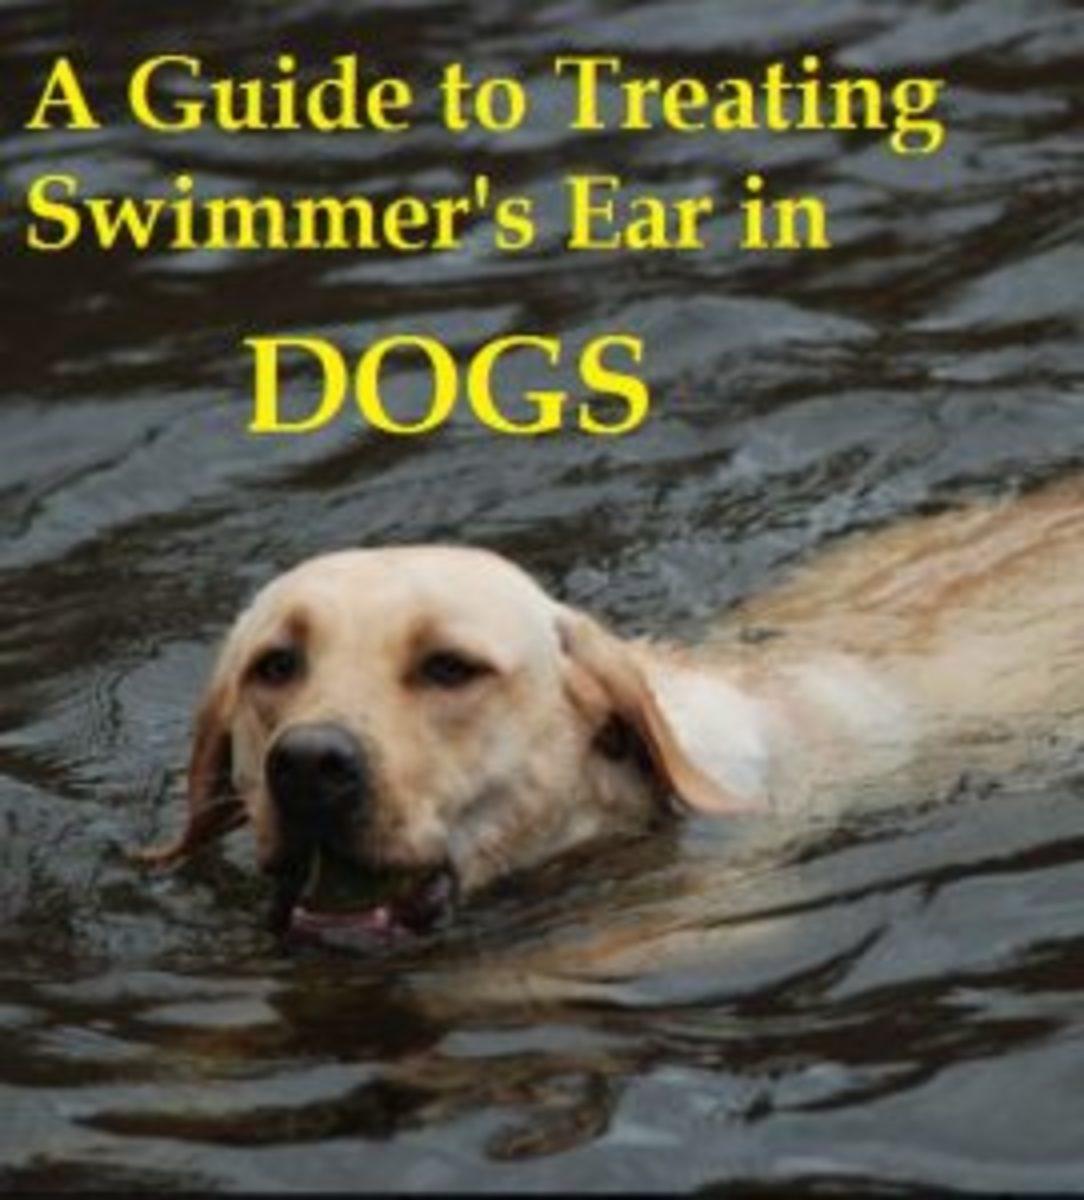 Treat dog swimmer's ear